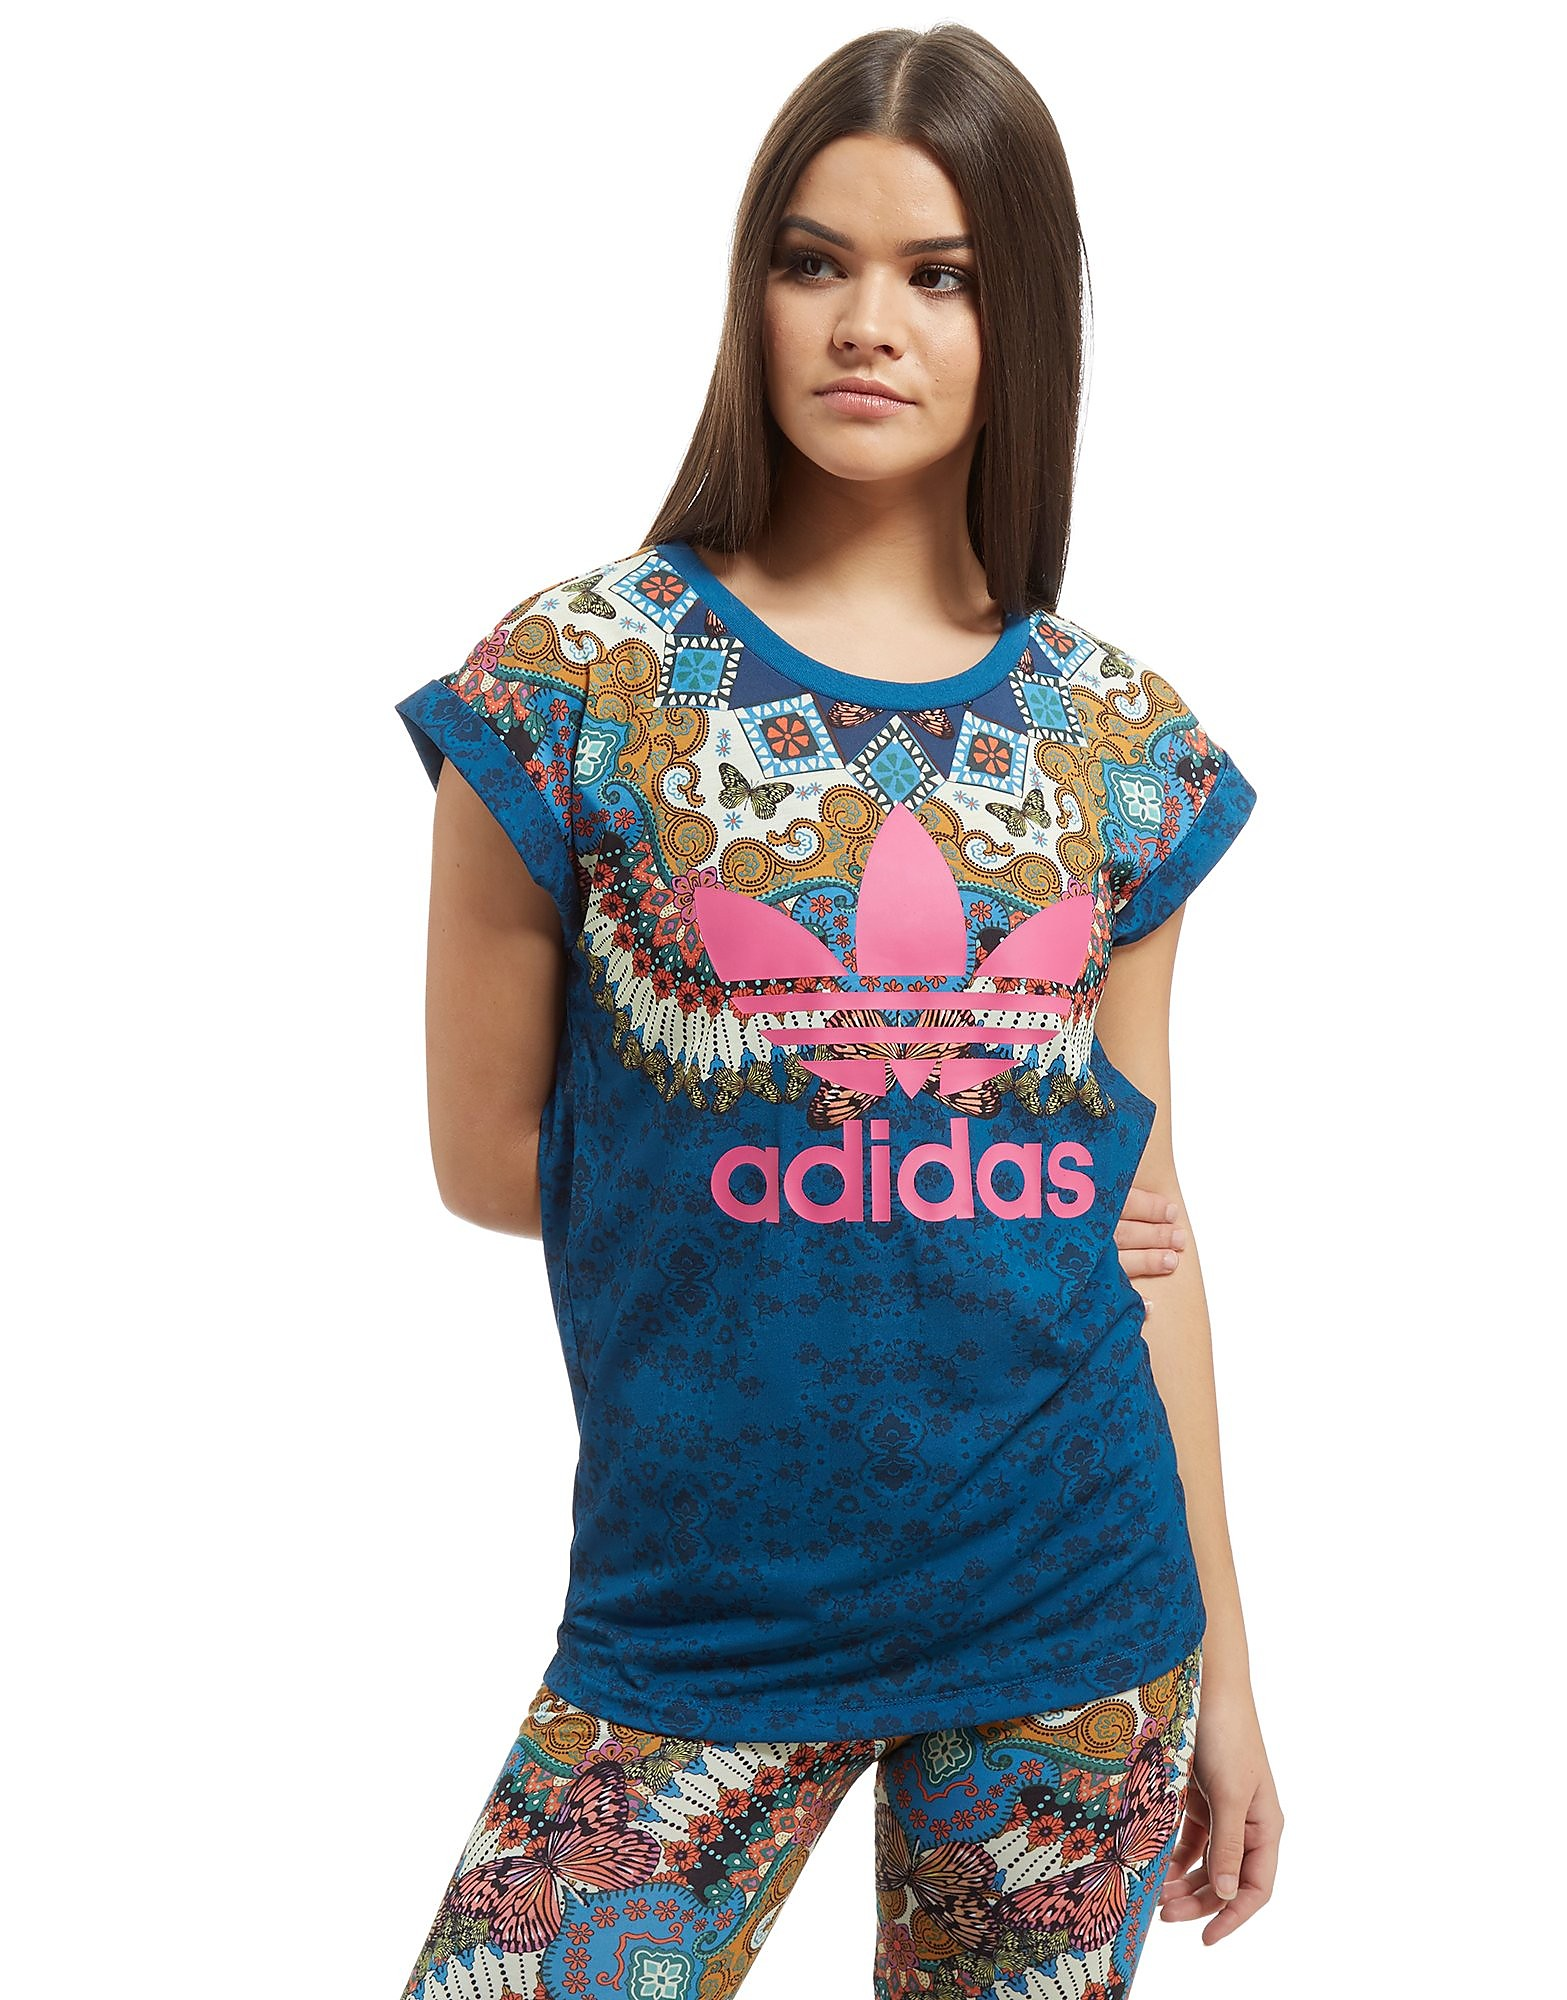 adidas Originals Borbomix T-Shirt